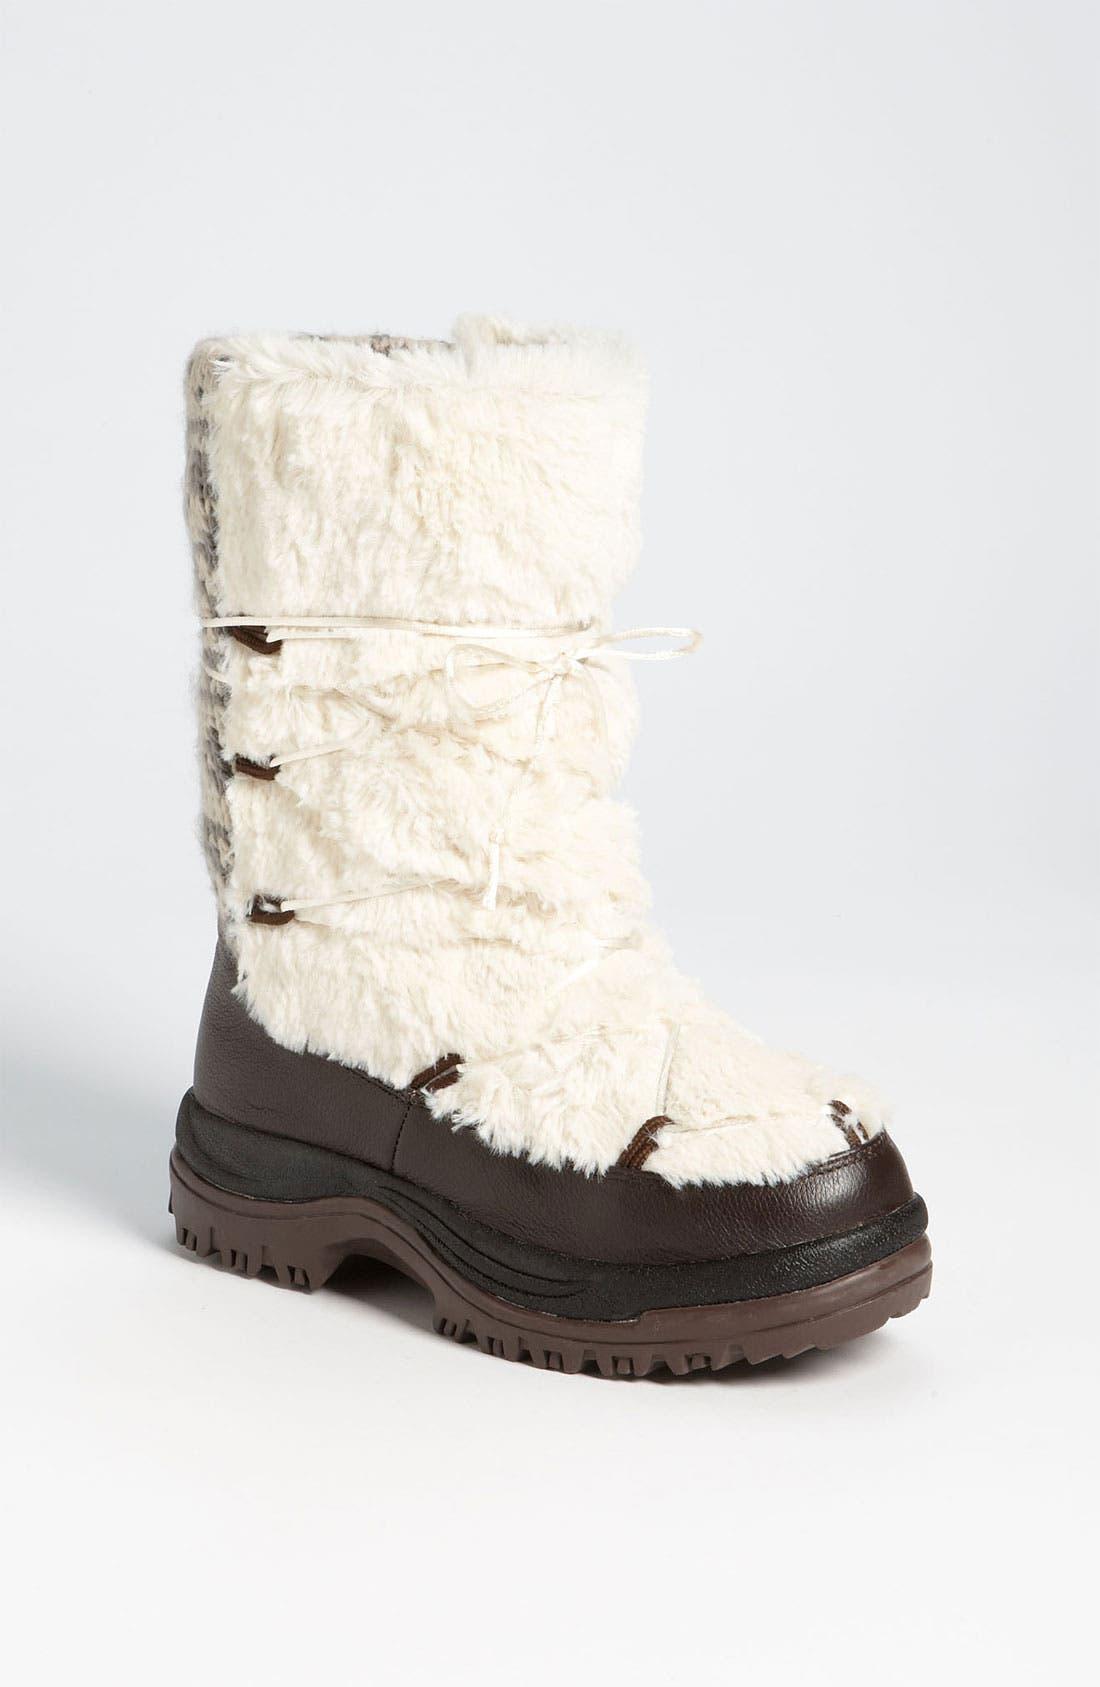 Alternate Image 1 Selected - MUK LUKS 'Massak Woodland' Snow Boot